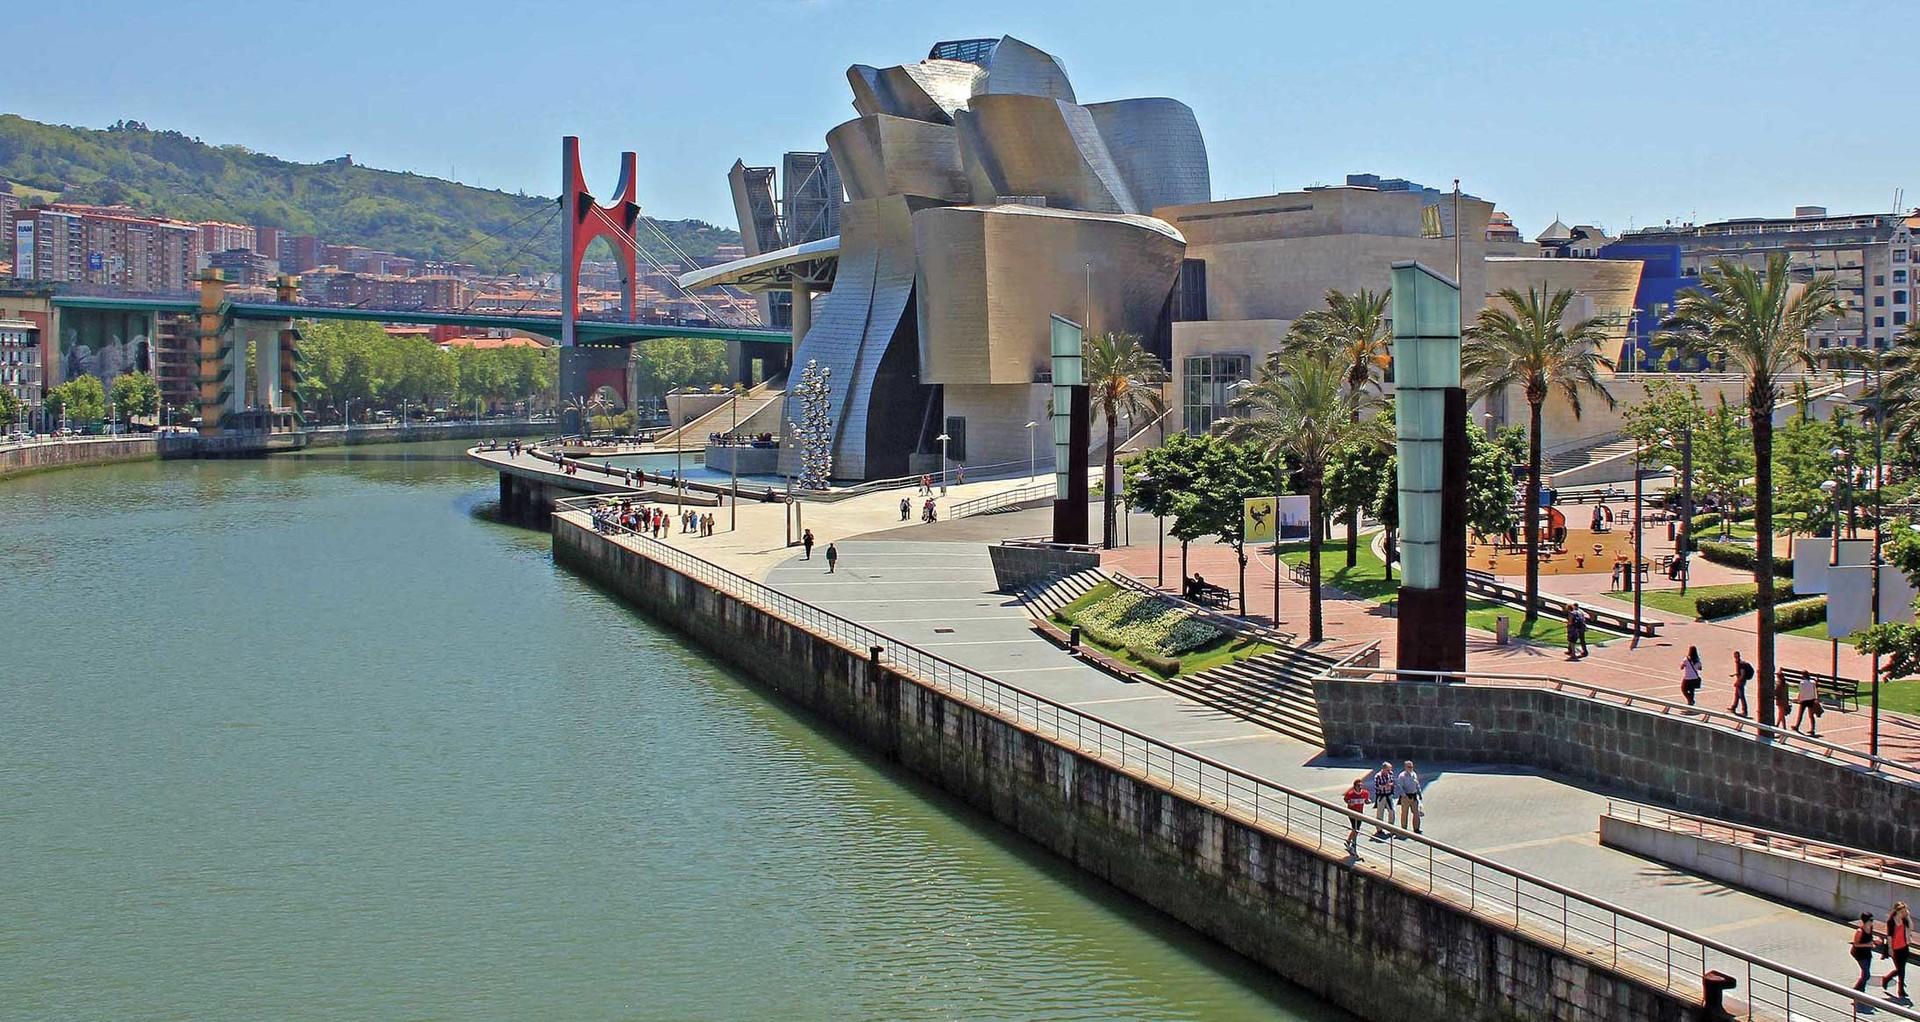 Esperienza Erasmus a Bilbao (Spagna)